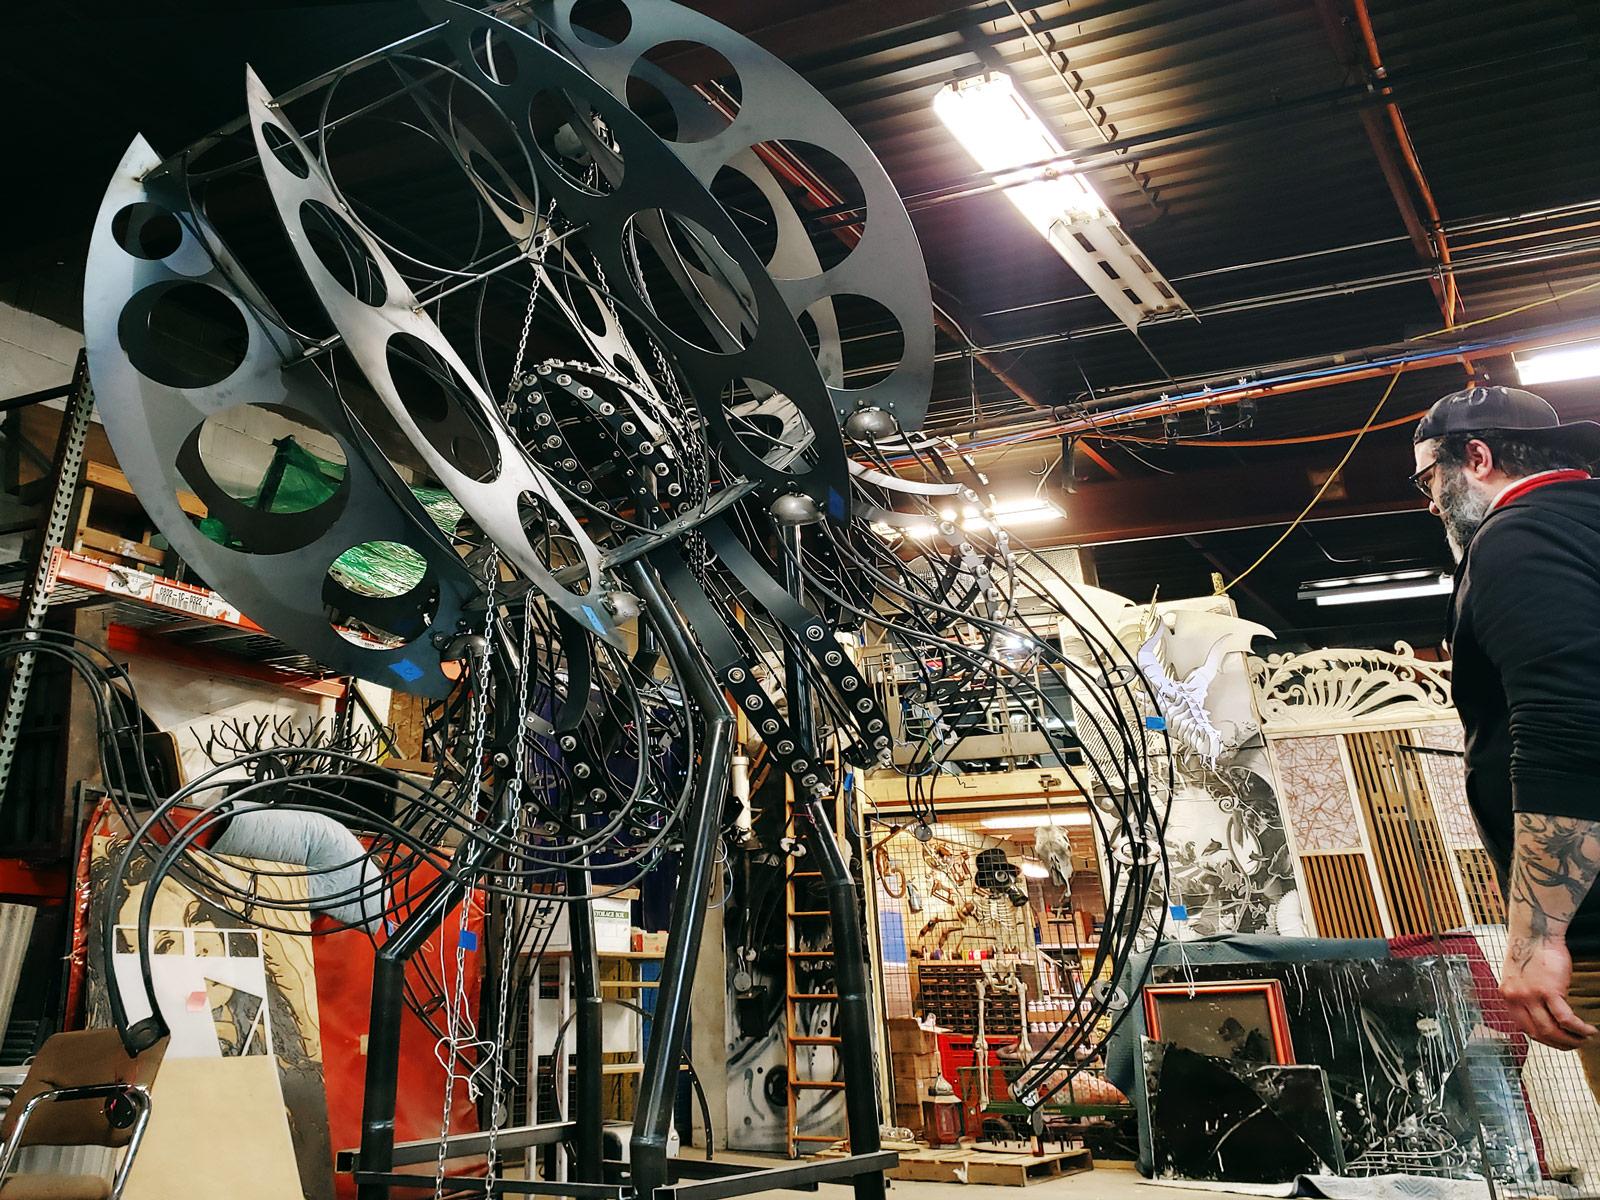 The still-in-progress jellyfish sculpture looms overhead.